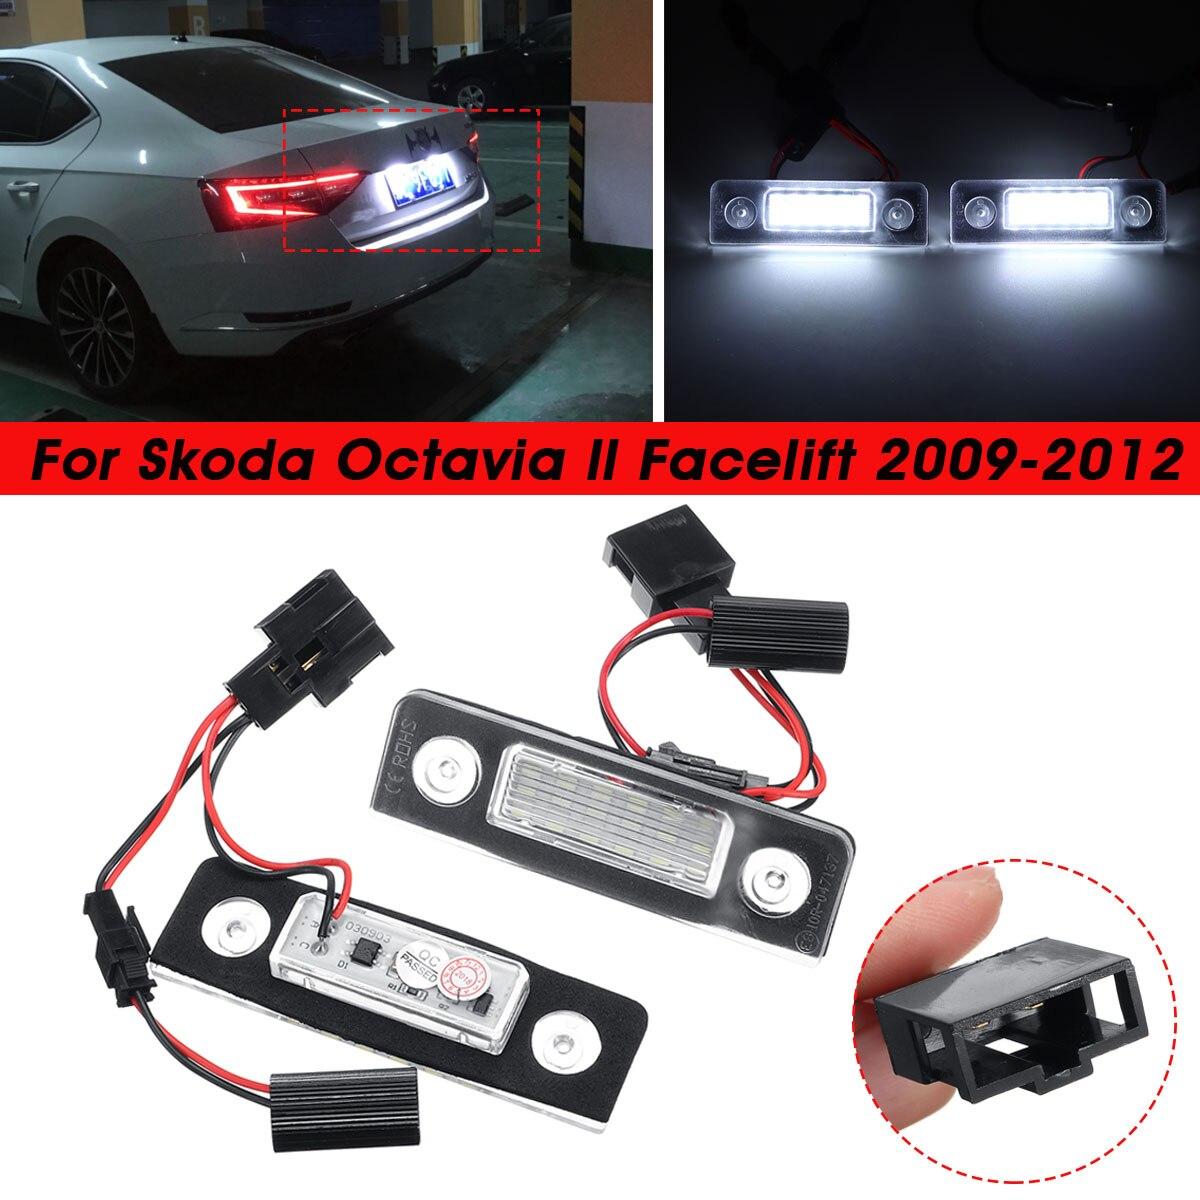 1 Pair Car LED Number License Plate Light For Skoda Octavia 2 Facelift 2009 -2012 Facelifted 2003-2012 Roomster 5J 2006-2010